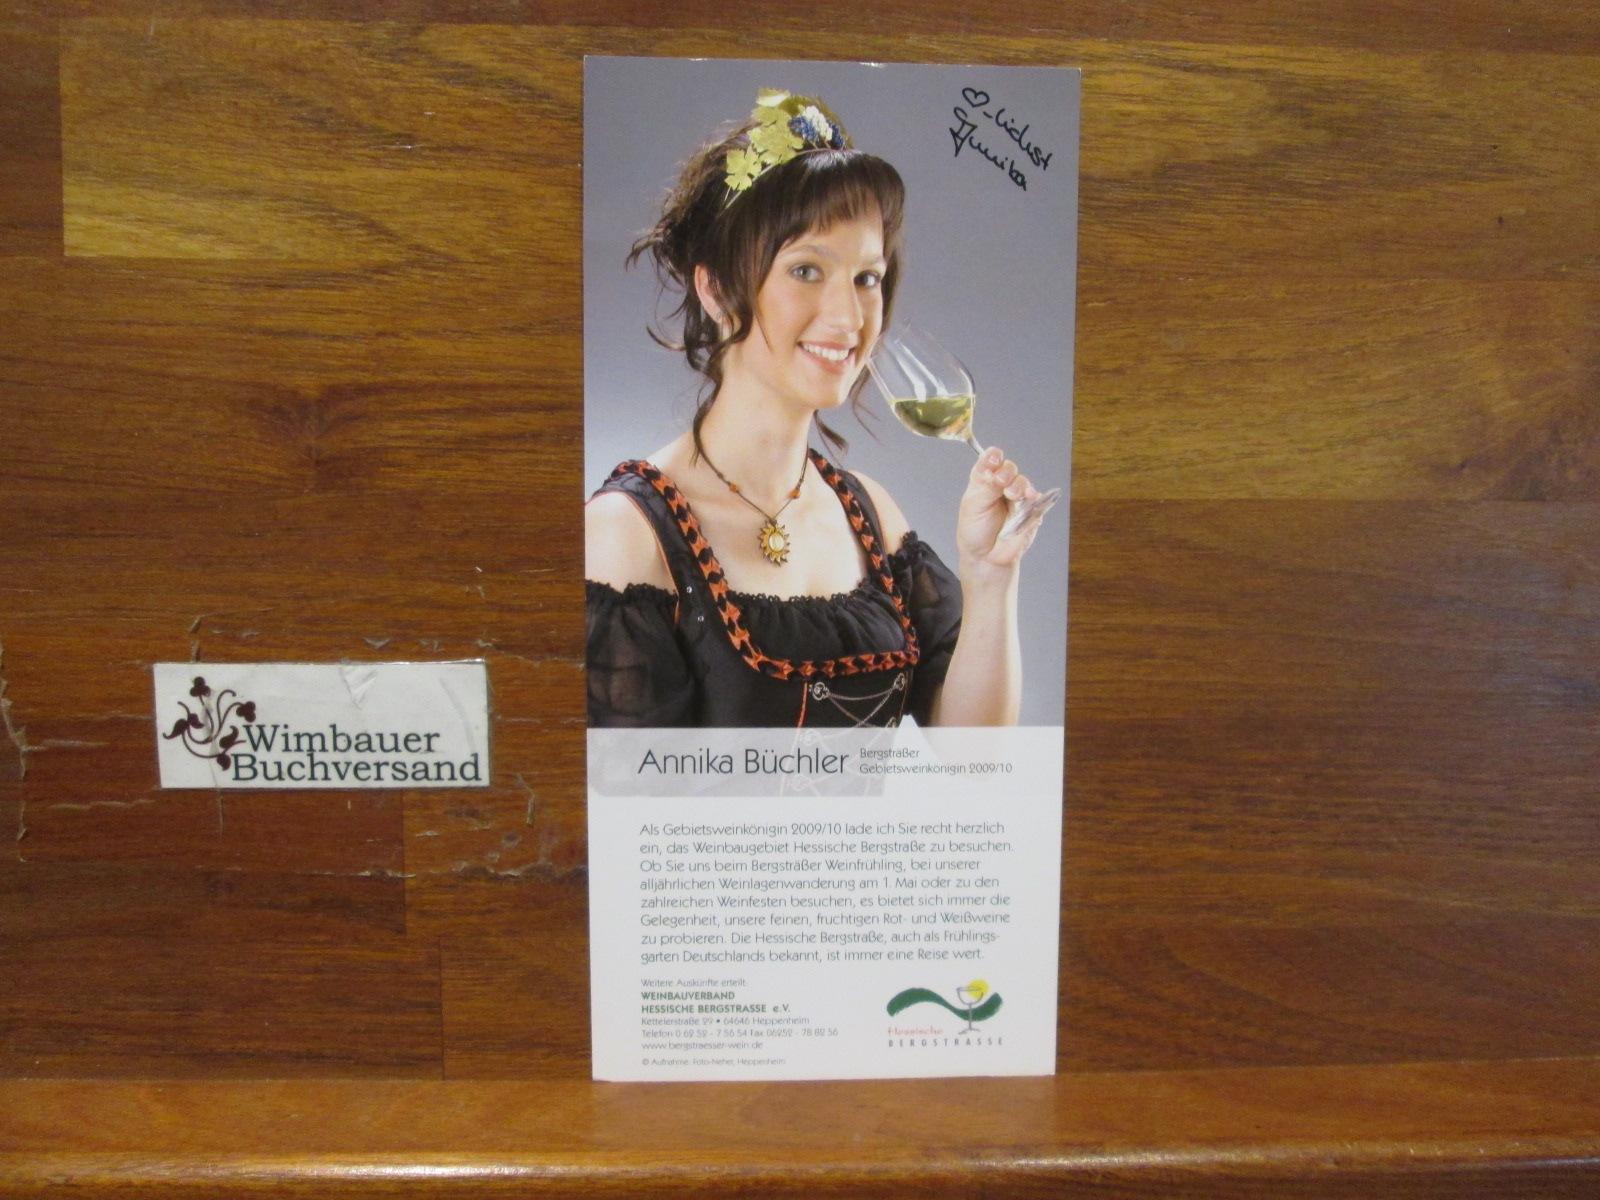 Original Autogramm Annika Büchler Bergsträsser Gebiets-Weinkönigin 2009-2010 /// Autogramm Autograph signiert signed signee